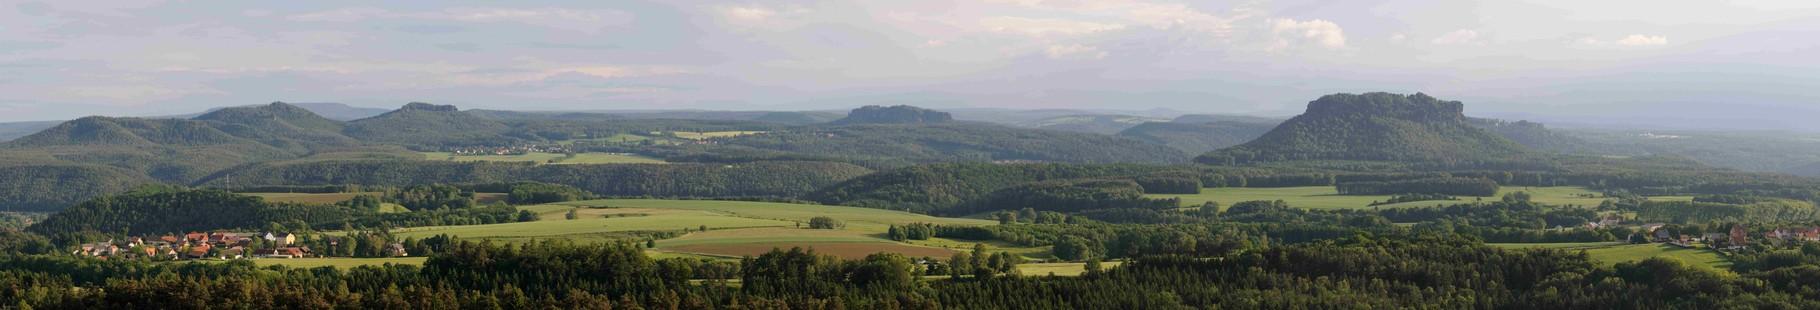 Panorama im Elbsandsteingebirge, Sachsen